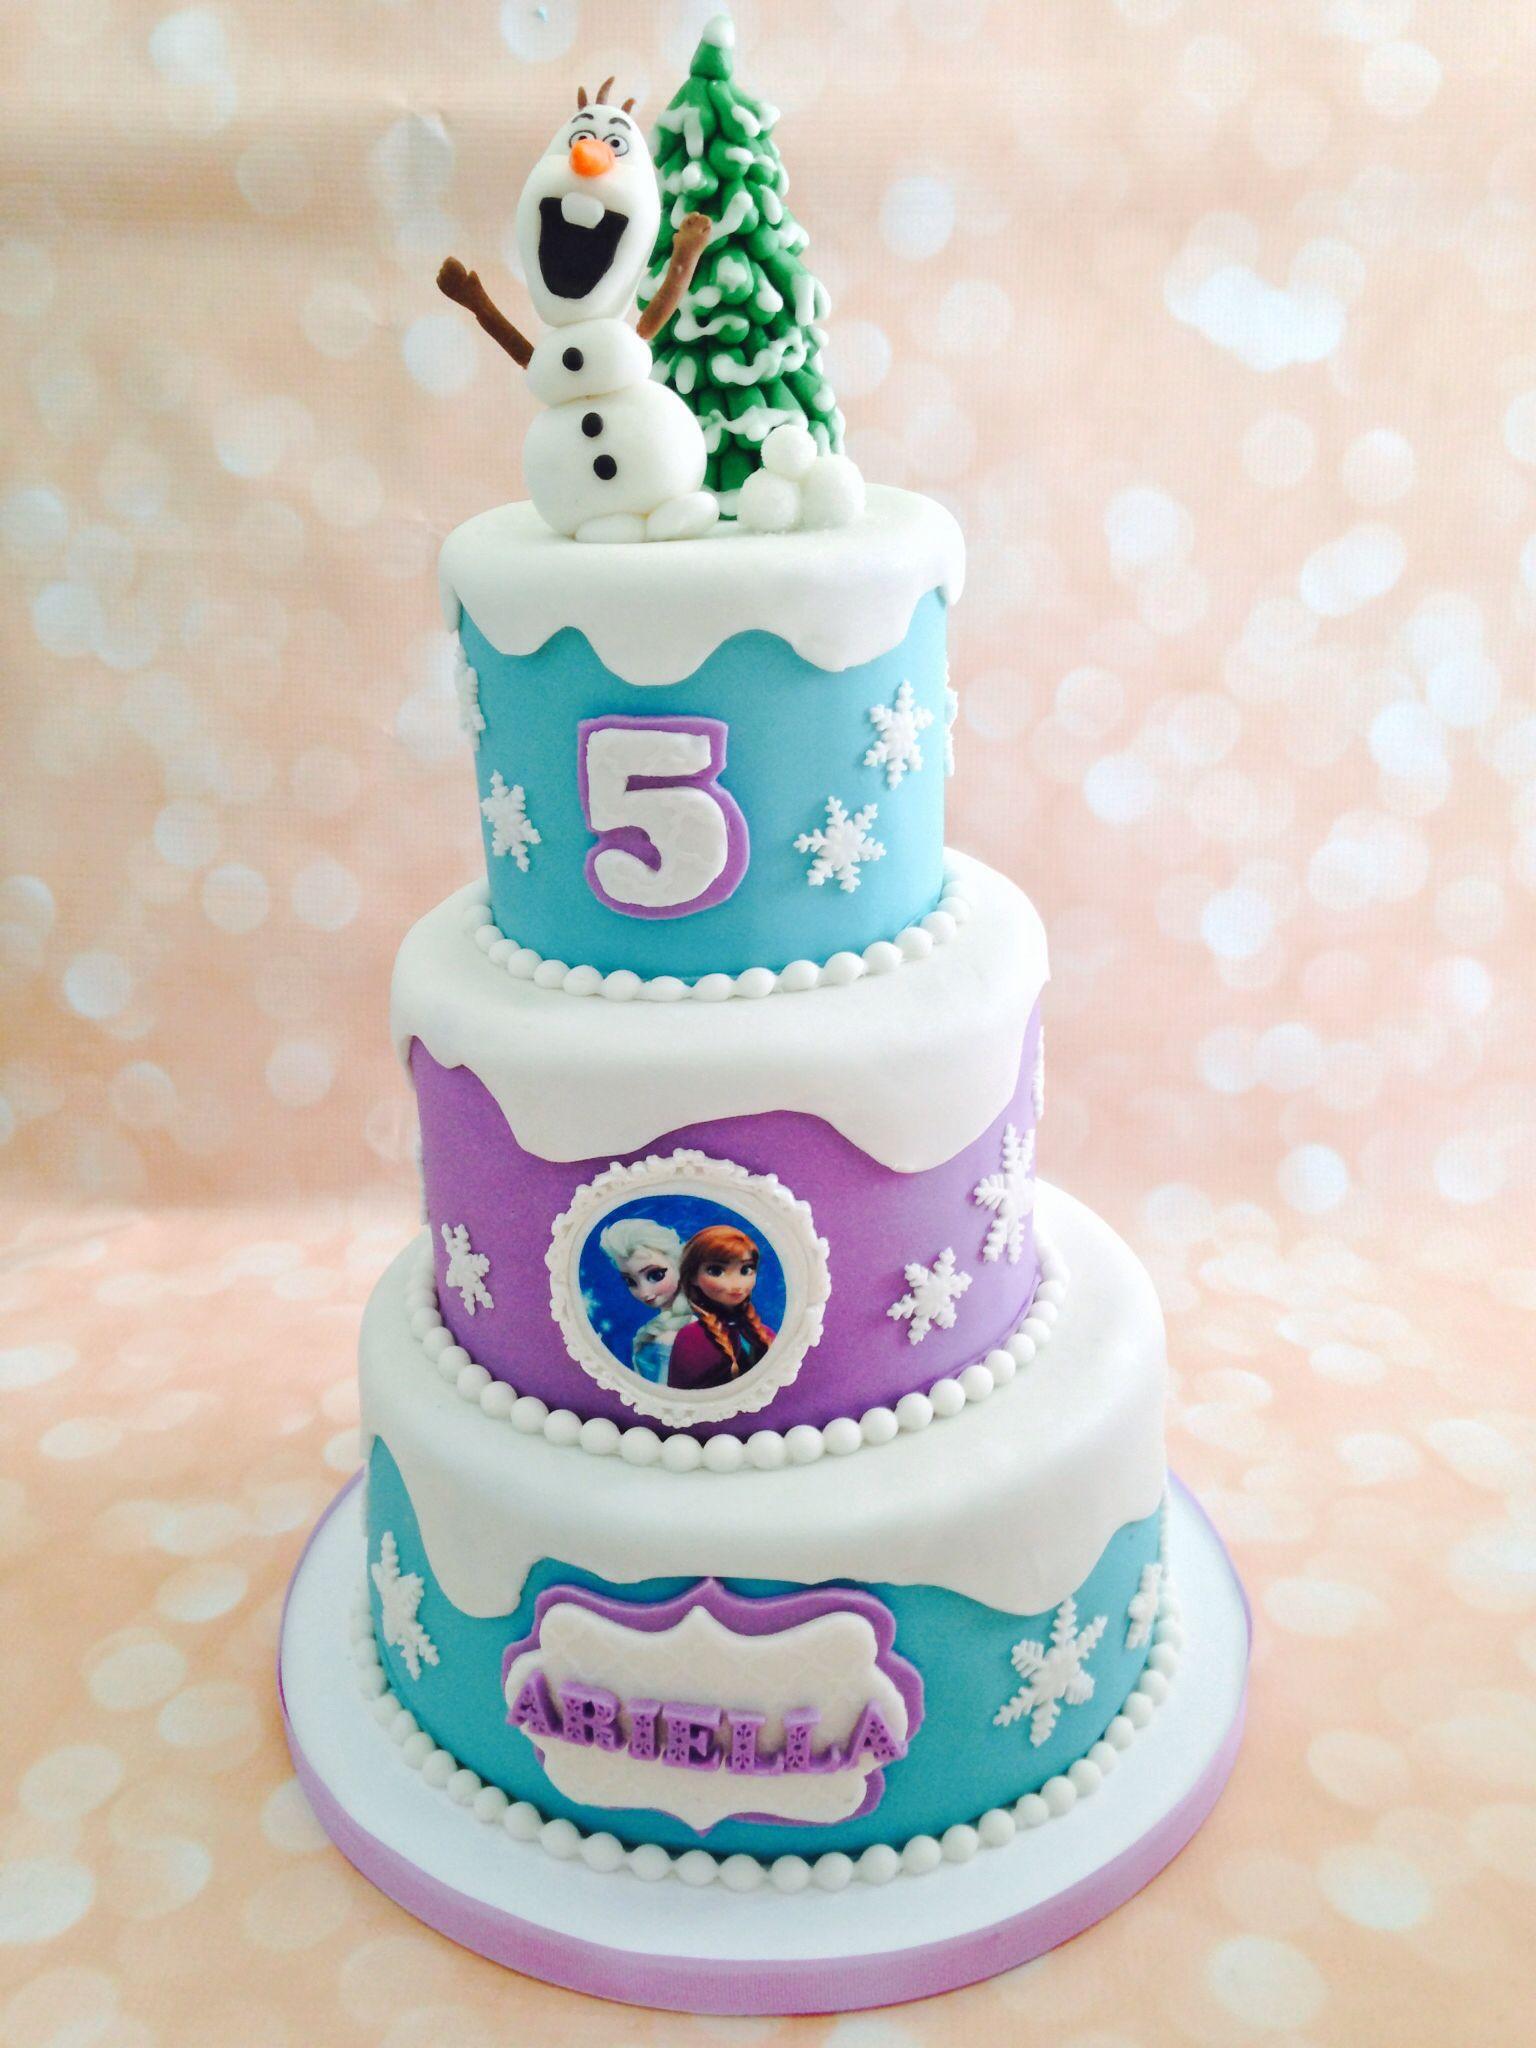 Frozen Cake Design Pinterest : Frozen party 3 tier cake Frozen Party ideas Pinterest ...